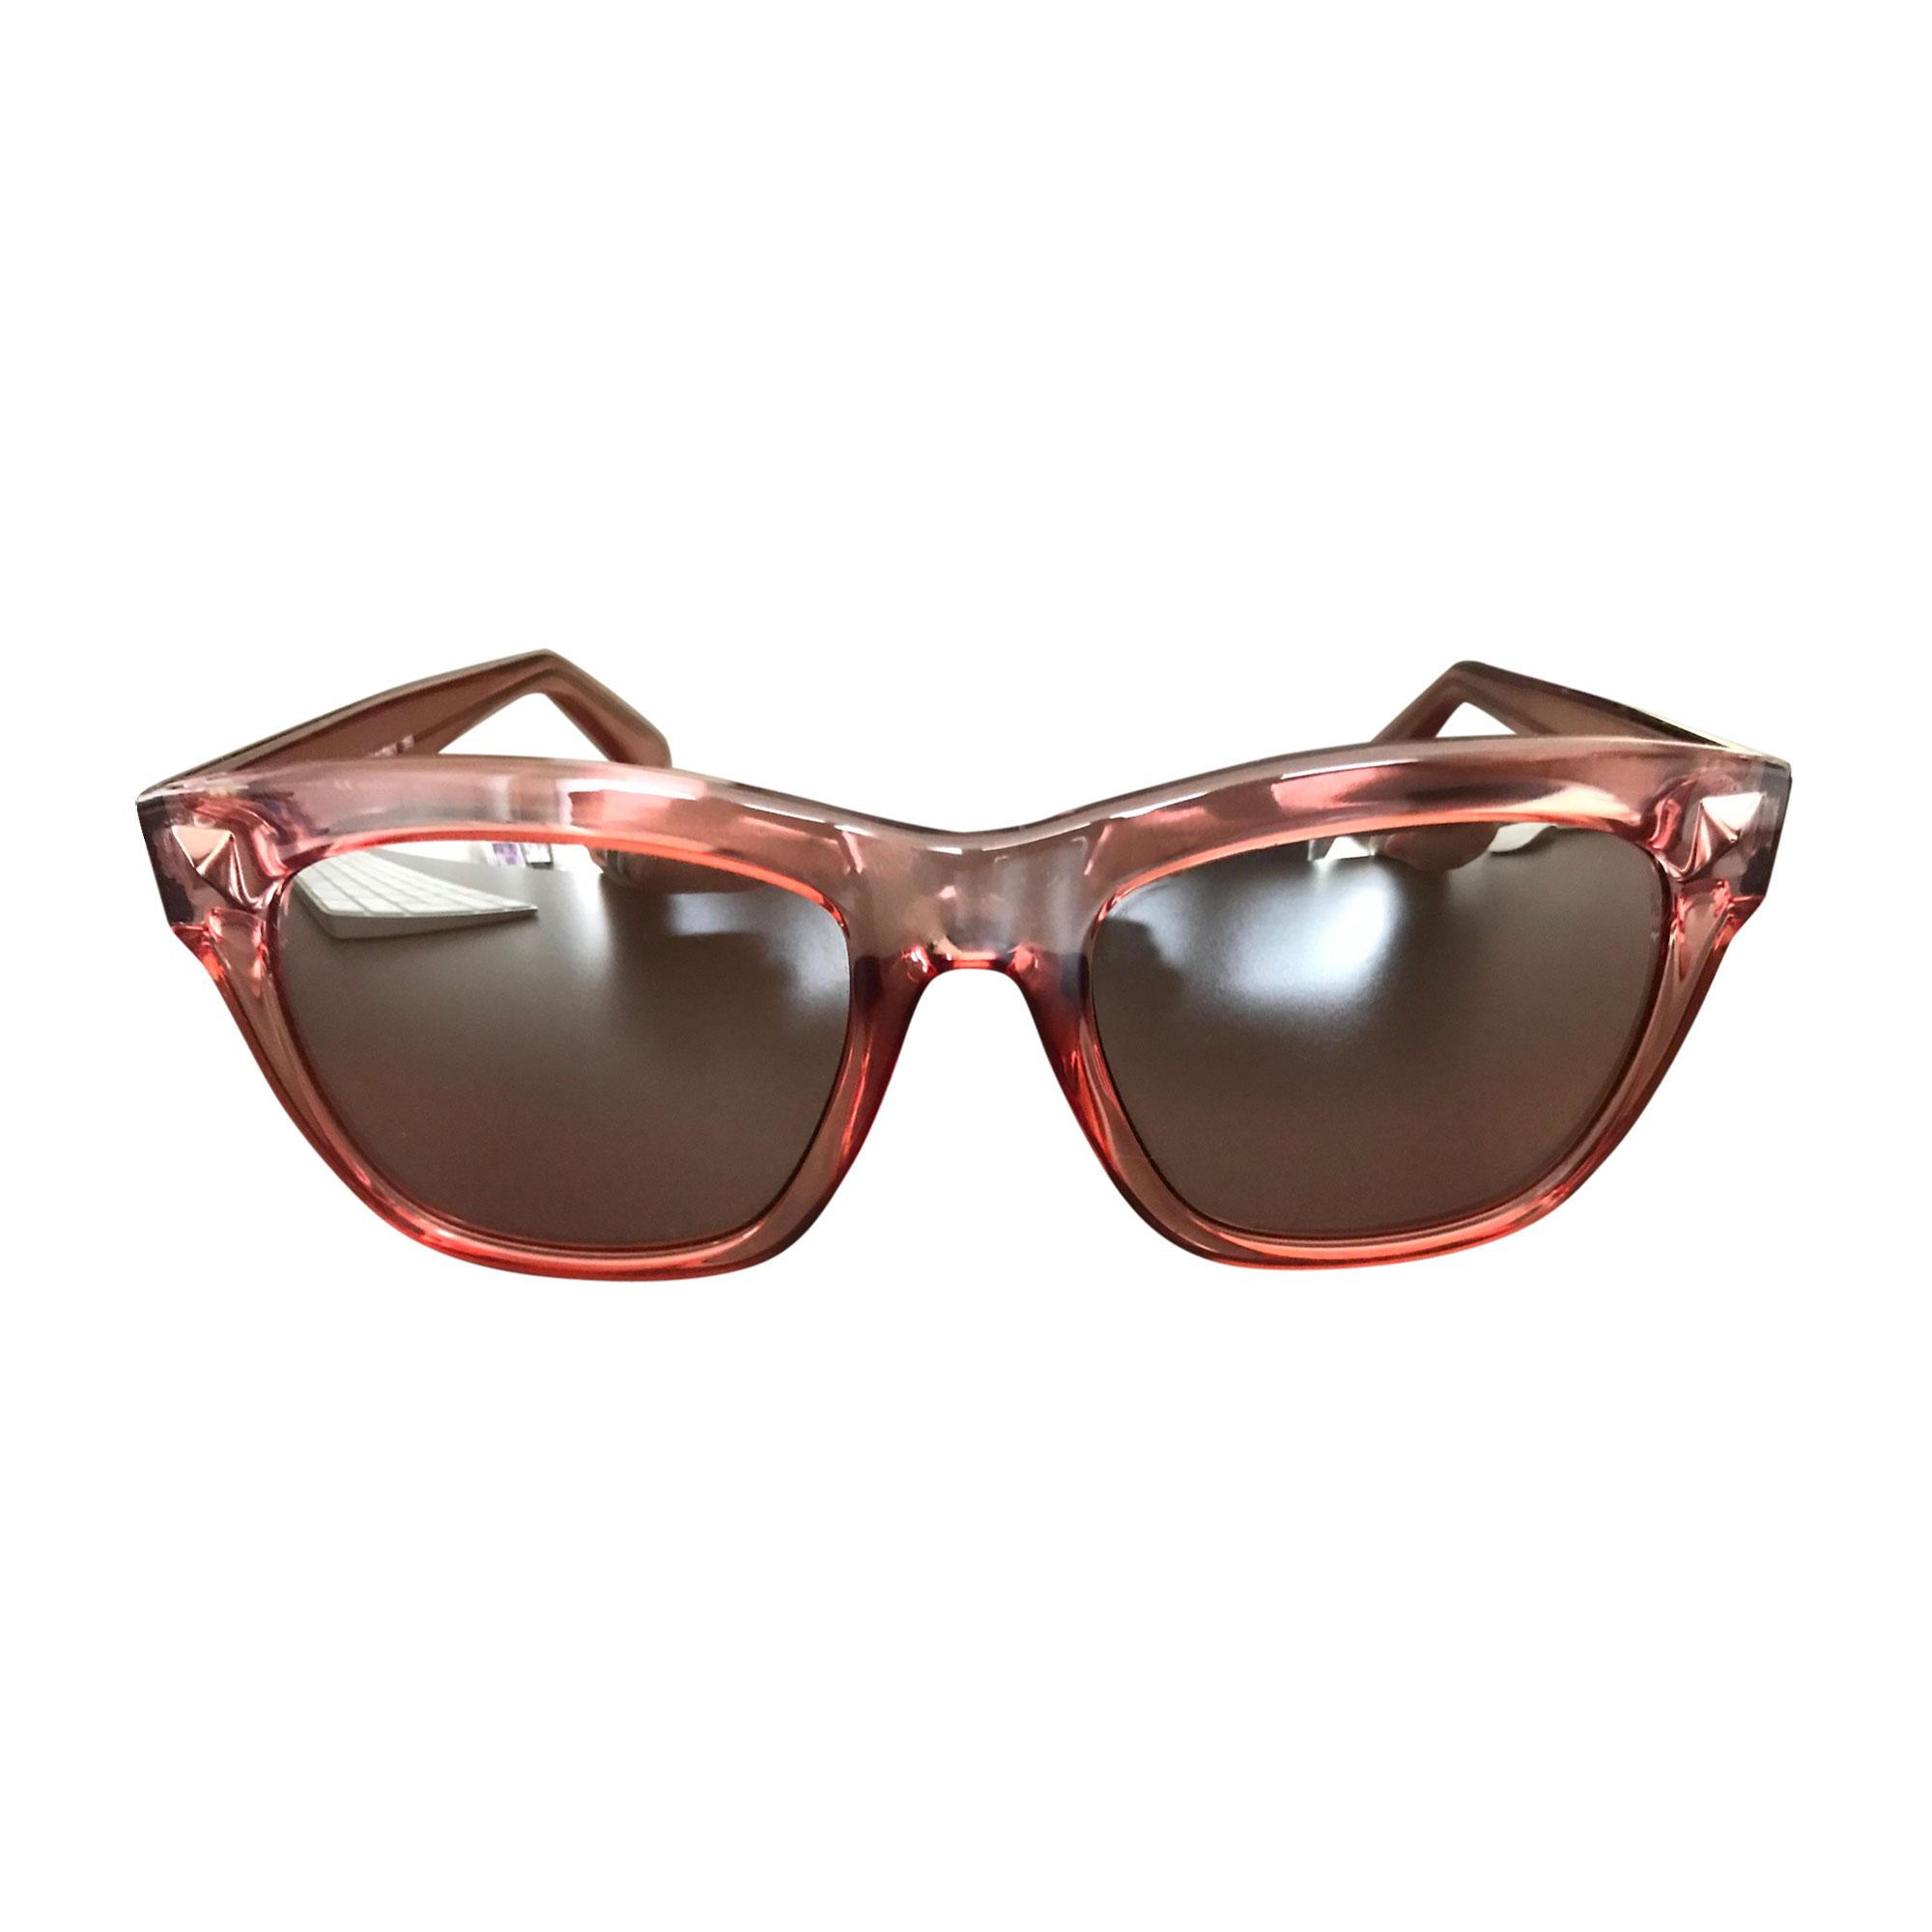 Sunglasses VALENTINO Pink, fuchsia, light pink